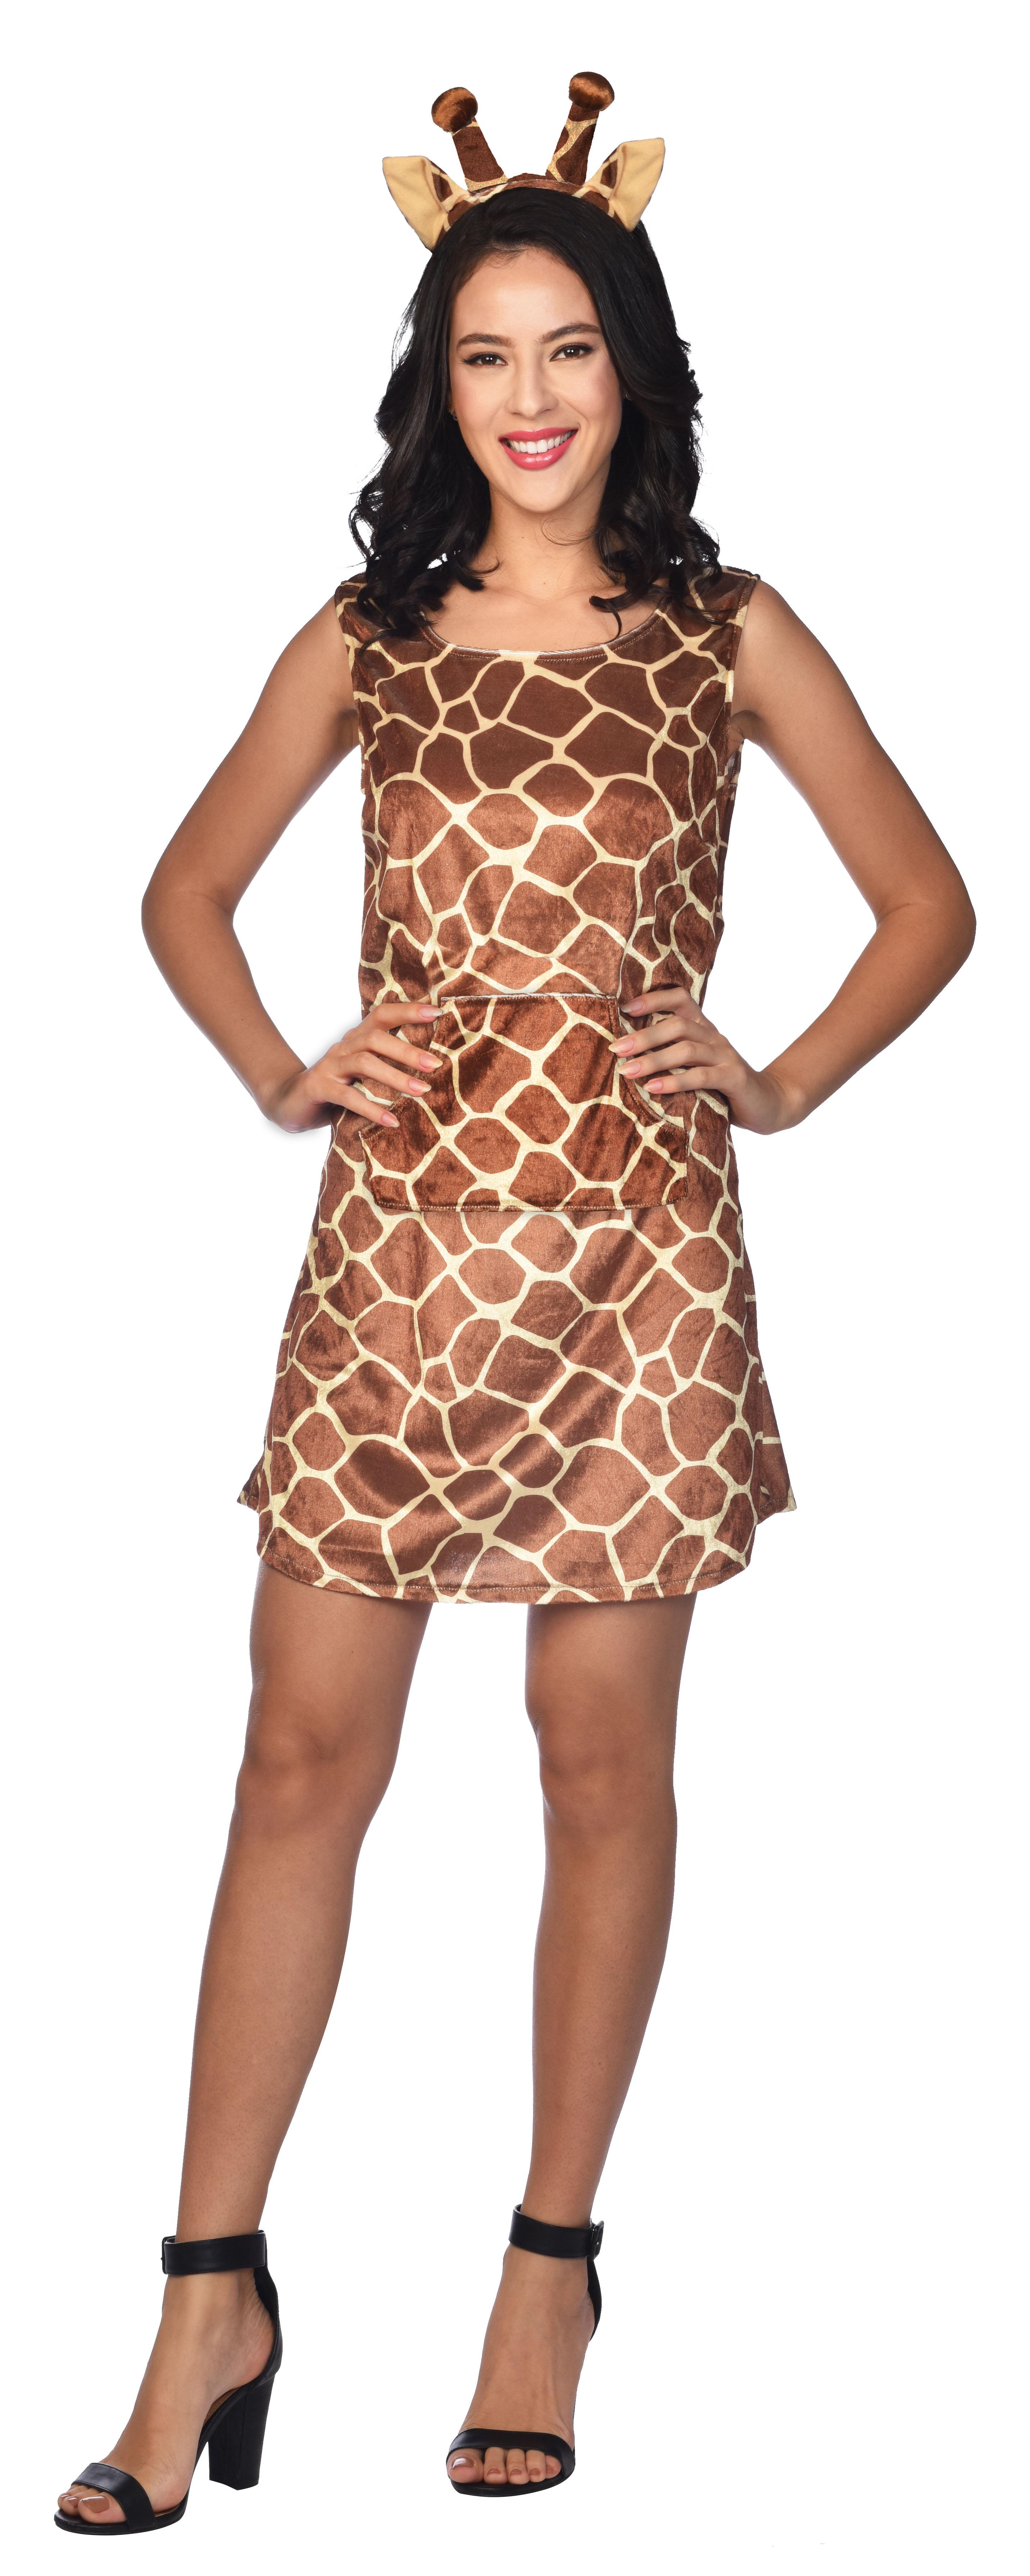 Indexbild 13 - Adult Ladies Zoo Safari Animal Giraffe Lady Fancy Dress Costume Womens Outfit